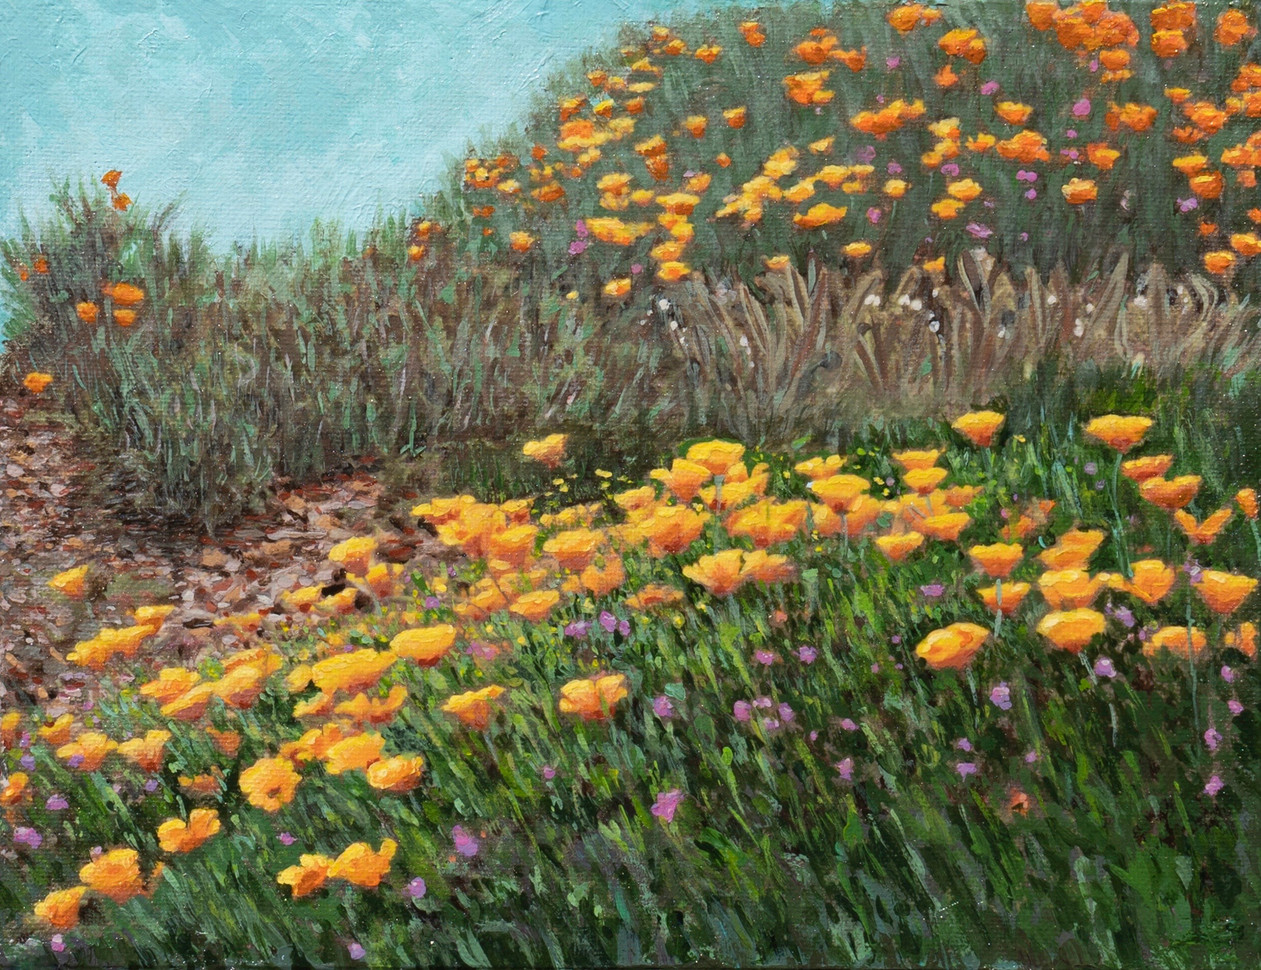 "Henrietta Sparkman (Modesto), Field of Imagination, 2020 Acrylic, 9"" x 11"" $400"